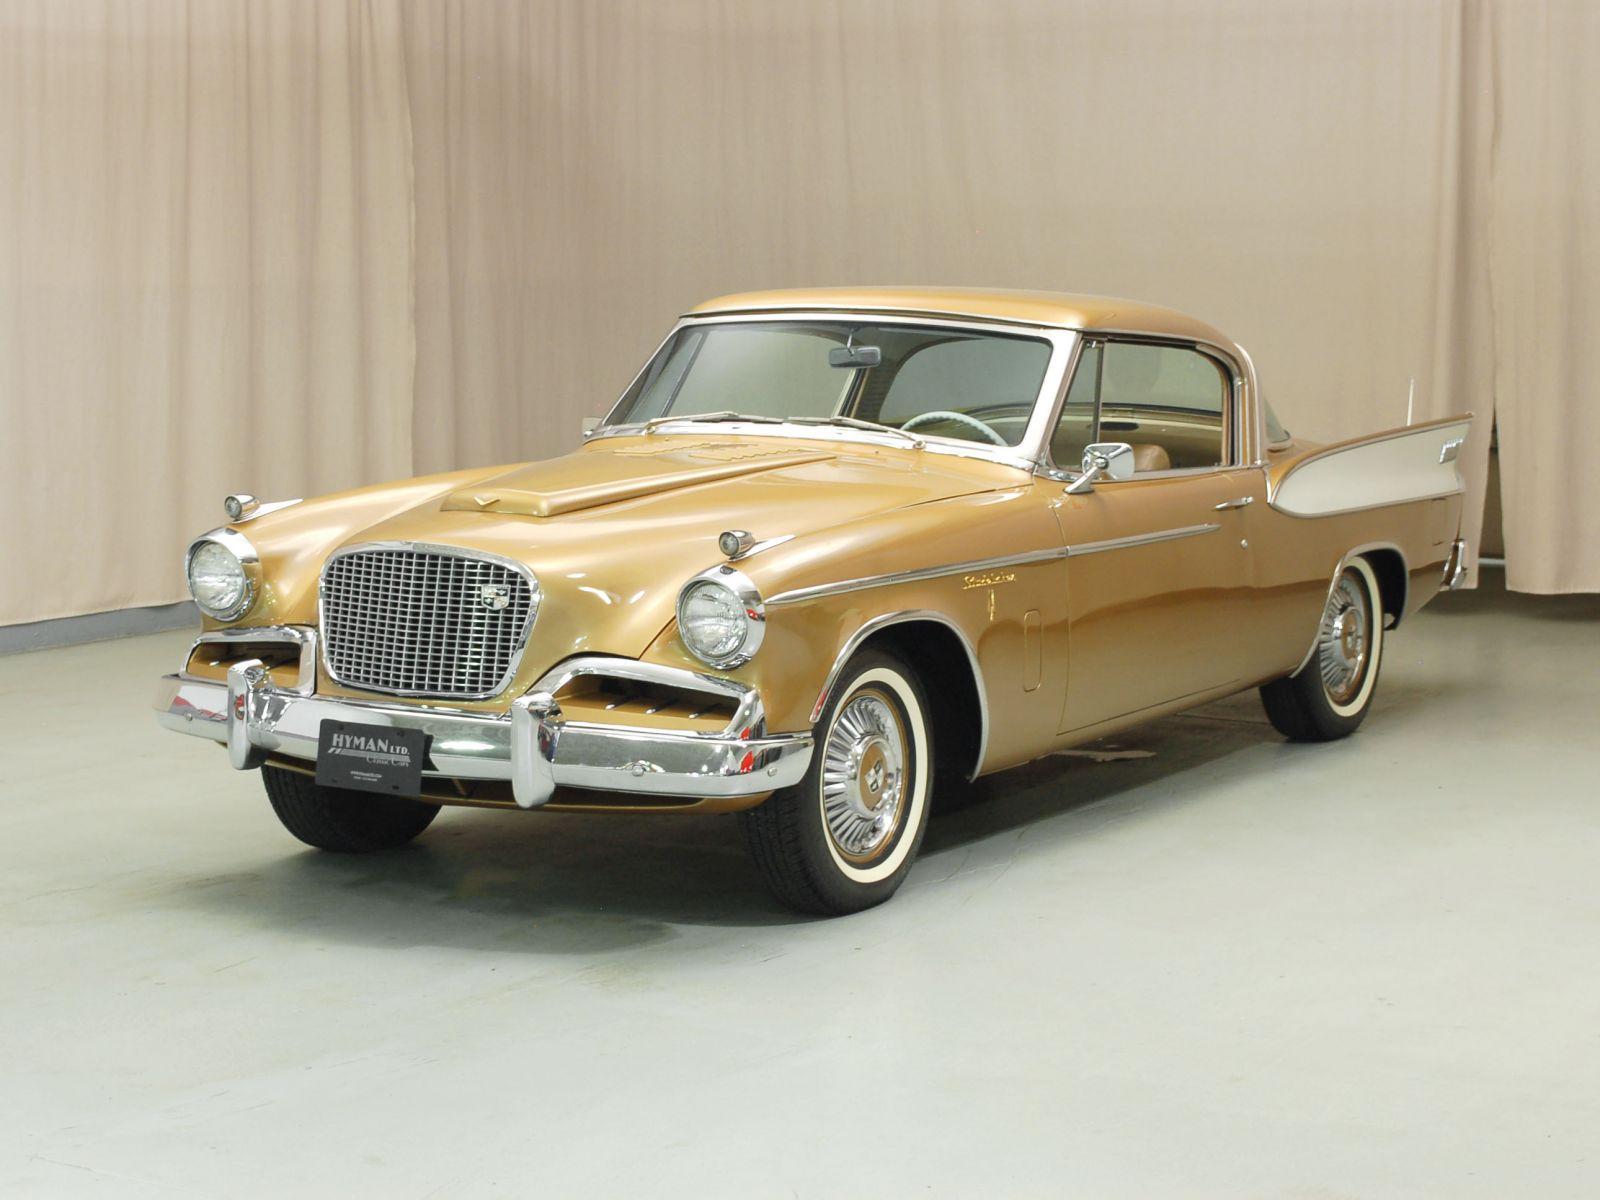 1957 Studebaker Golden Hawk Hyman Ltd